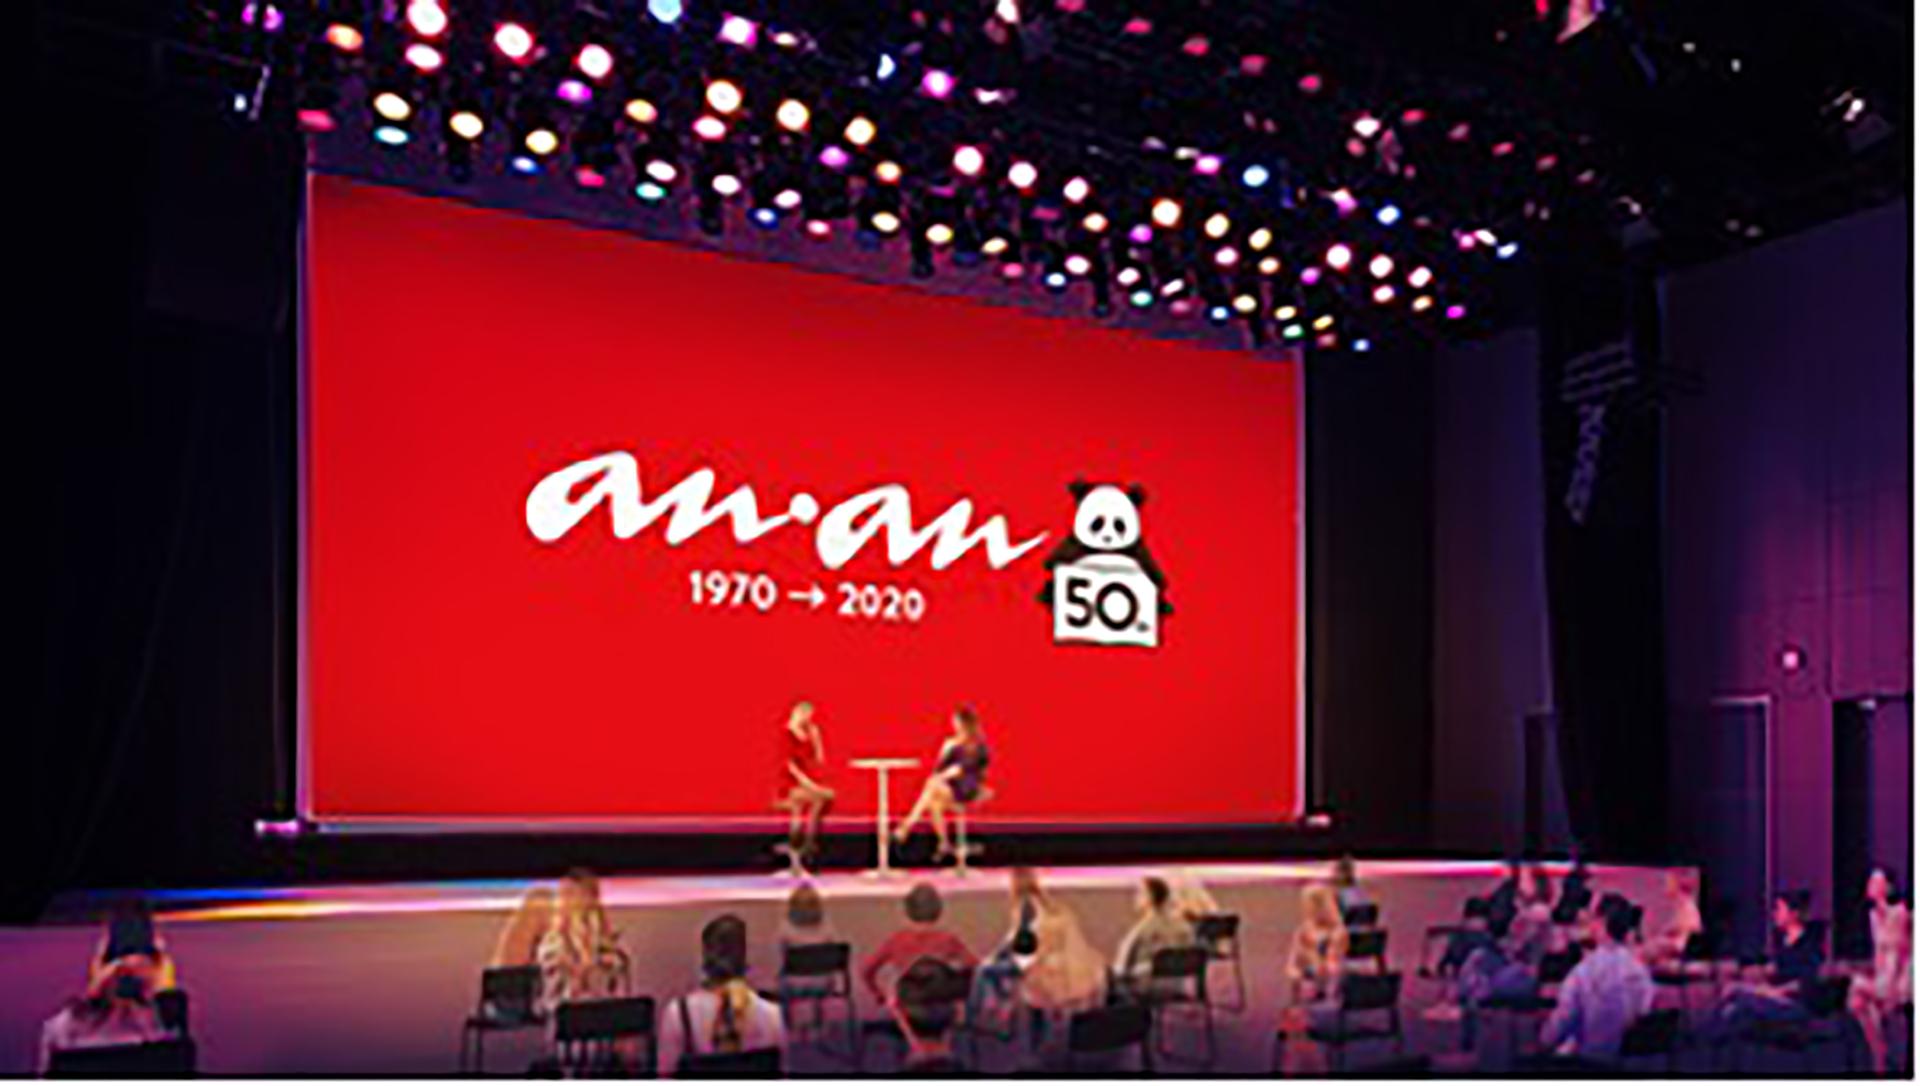 SHIBUYA SCRAMBLE FESTIVAL 2020 Produced by anan